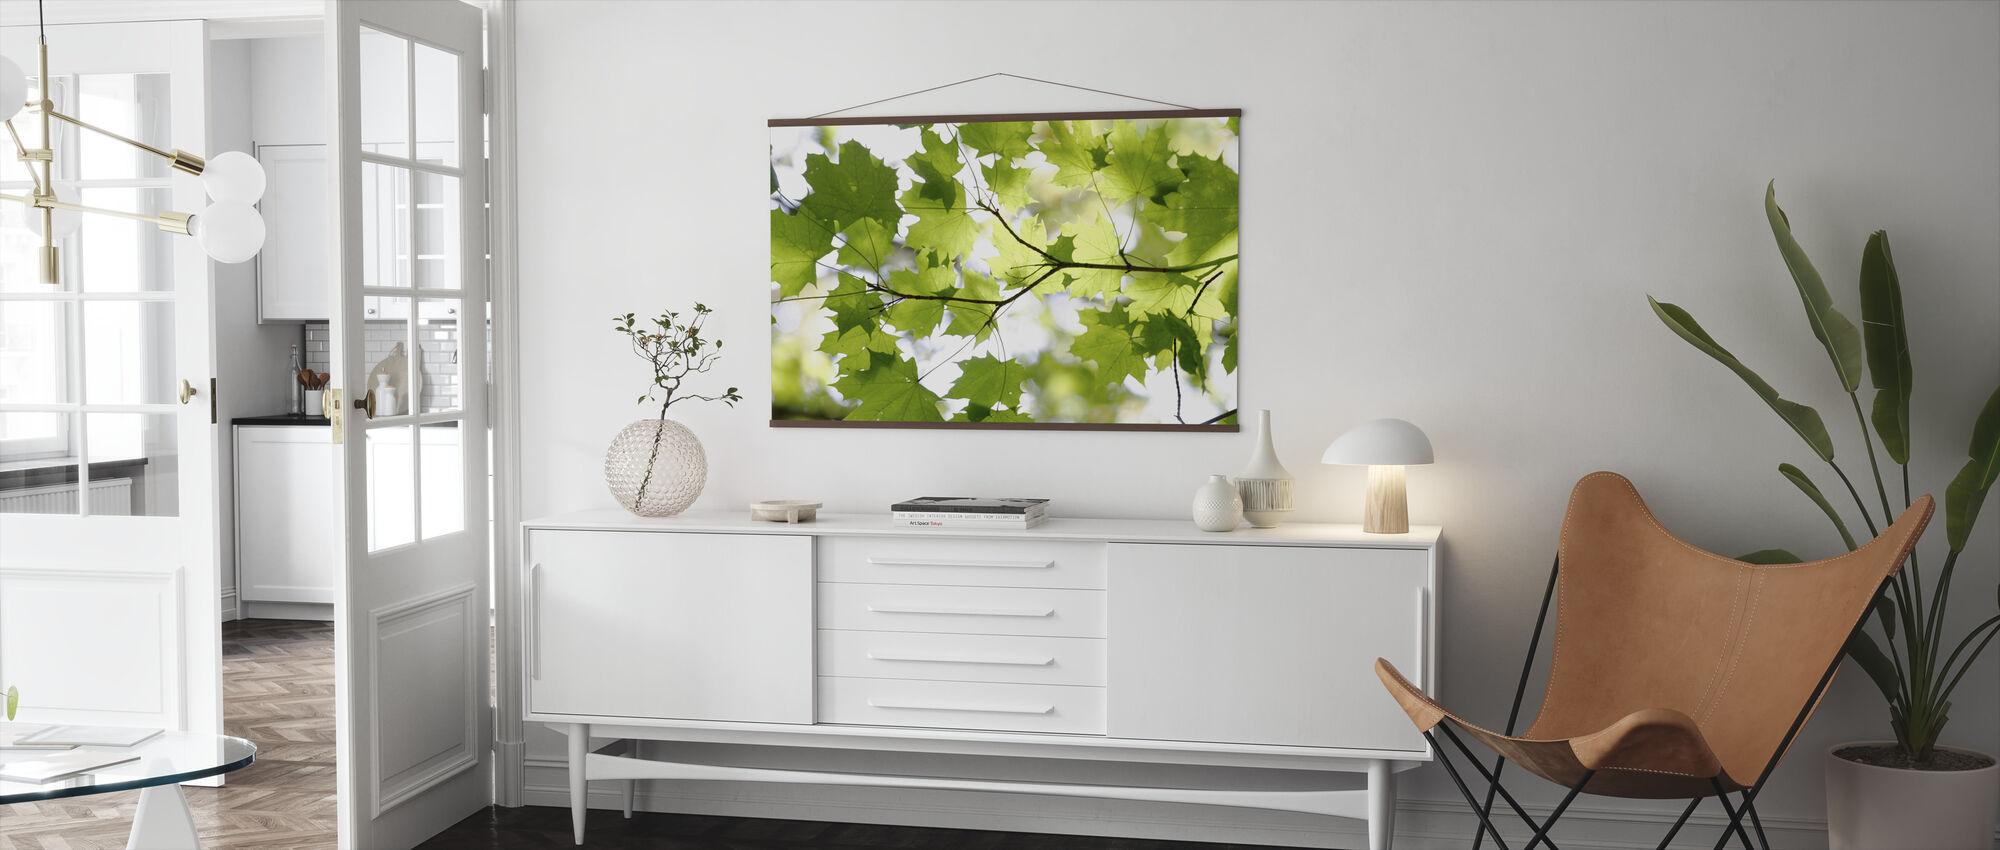 Grønt blad - Plakat - Stue